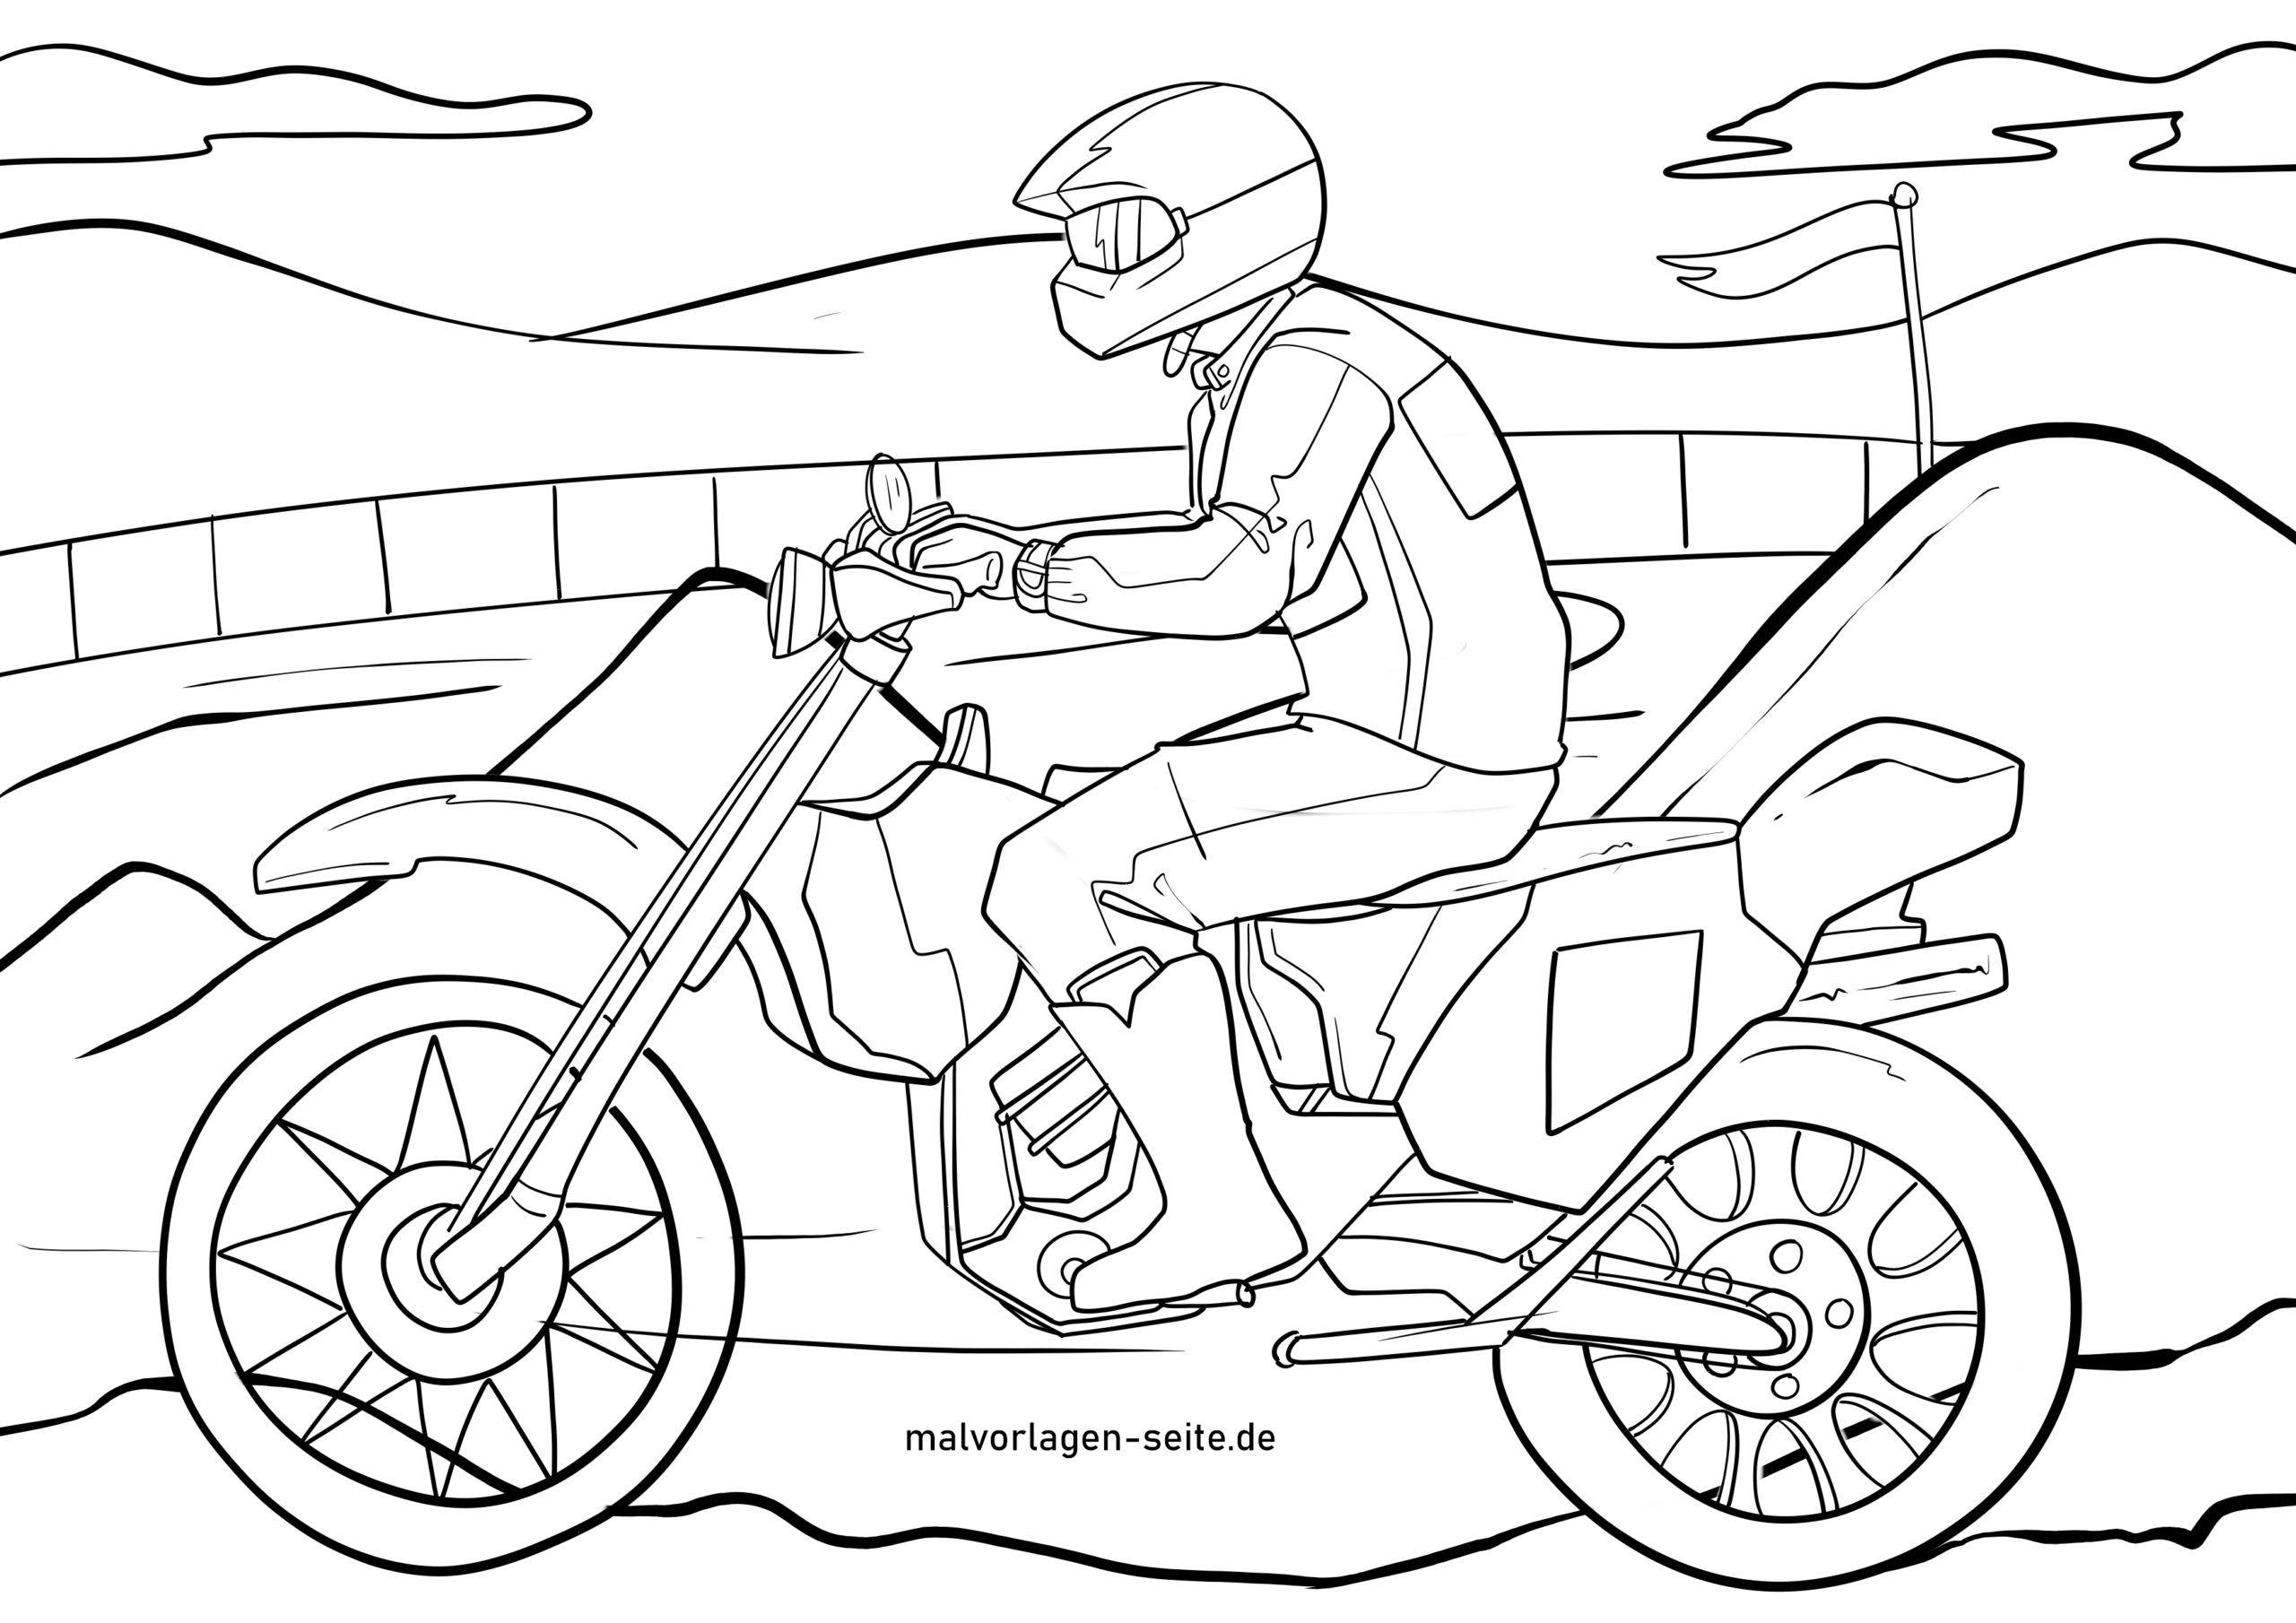 Malvorlage Motocross  Motorrad - Kostenlose Ausmalbilder